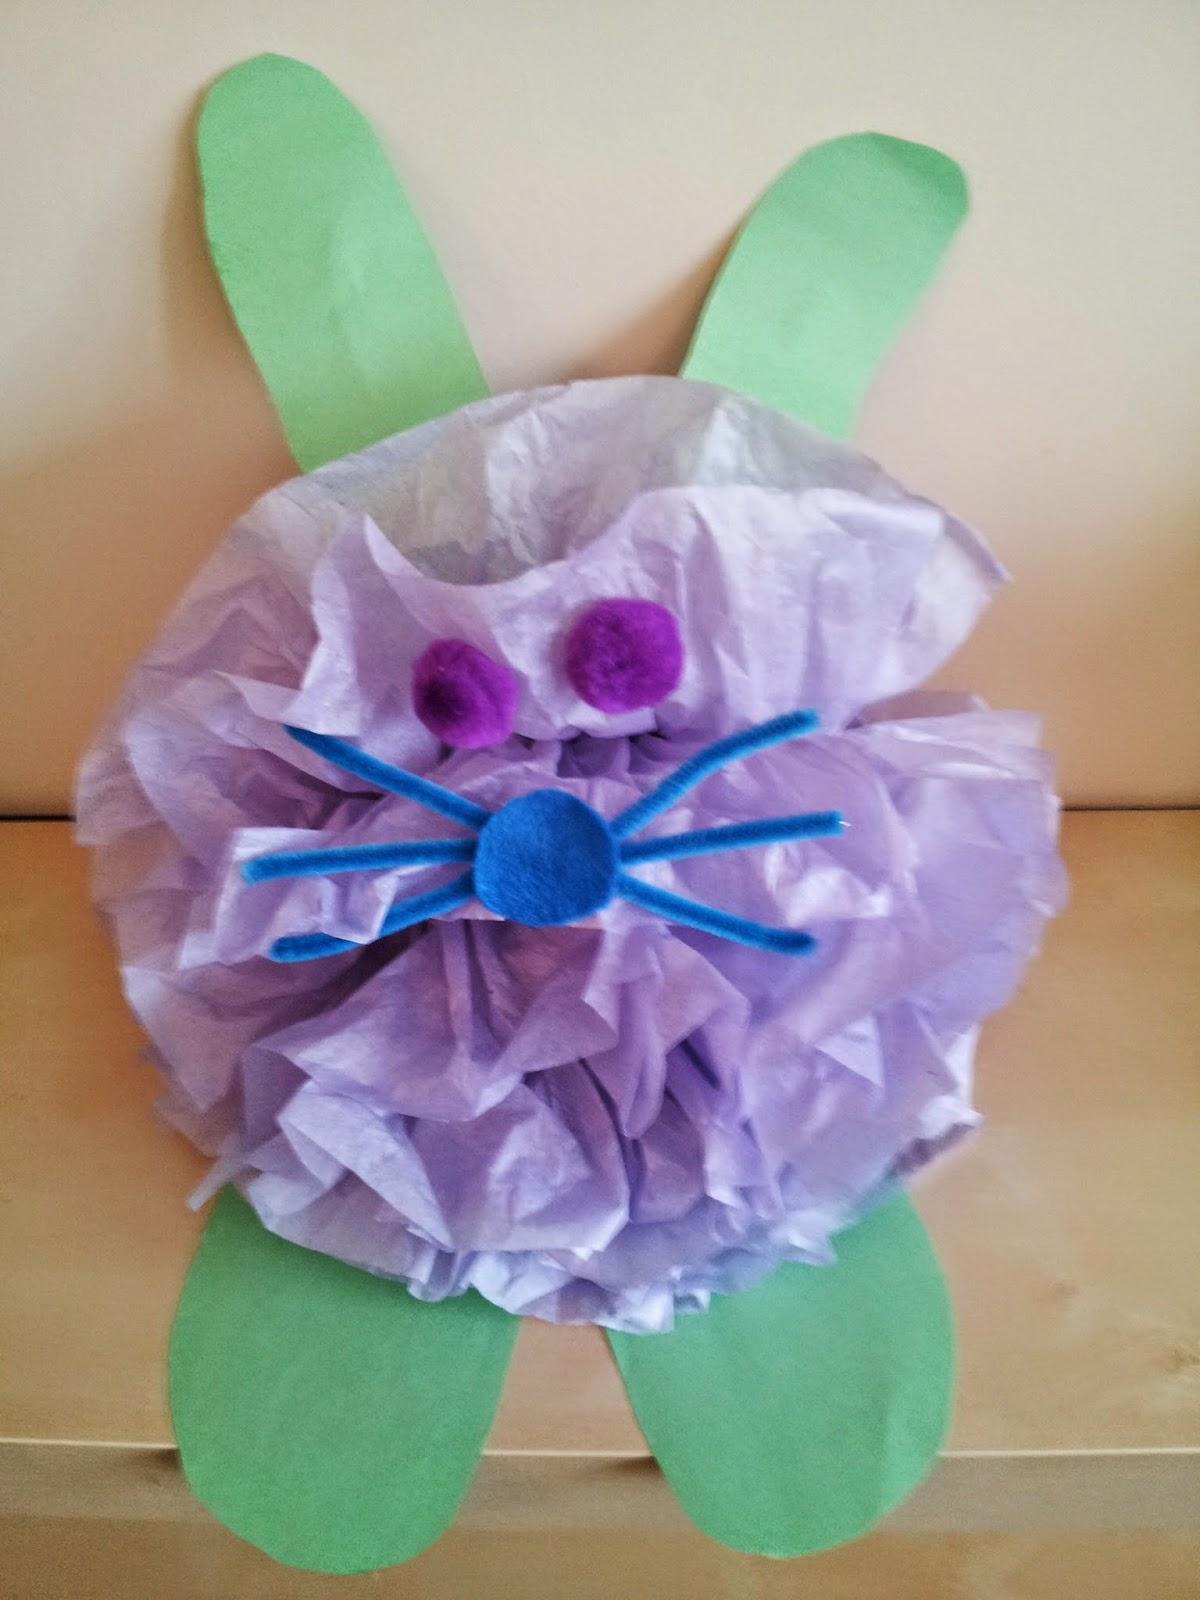 Easter bunny craft, tissue paper crafts, kids crafts